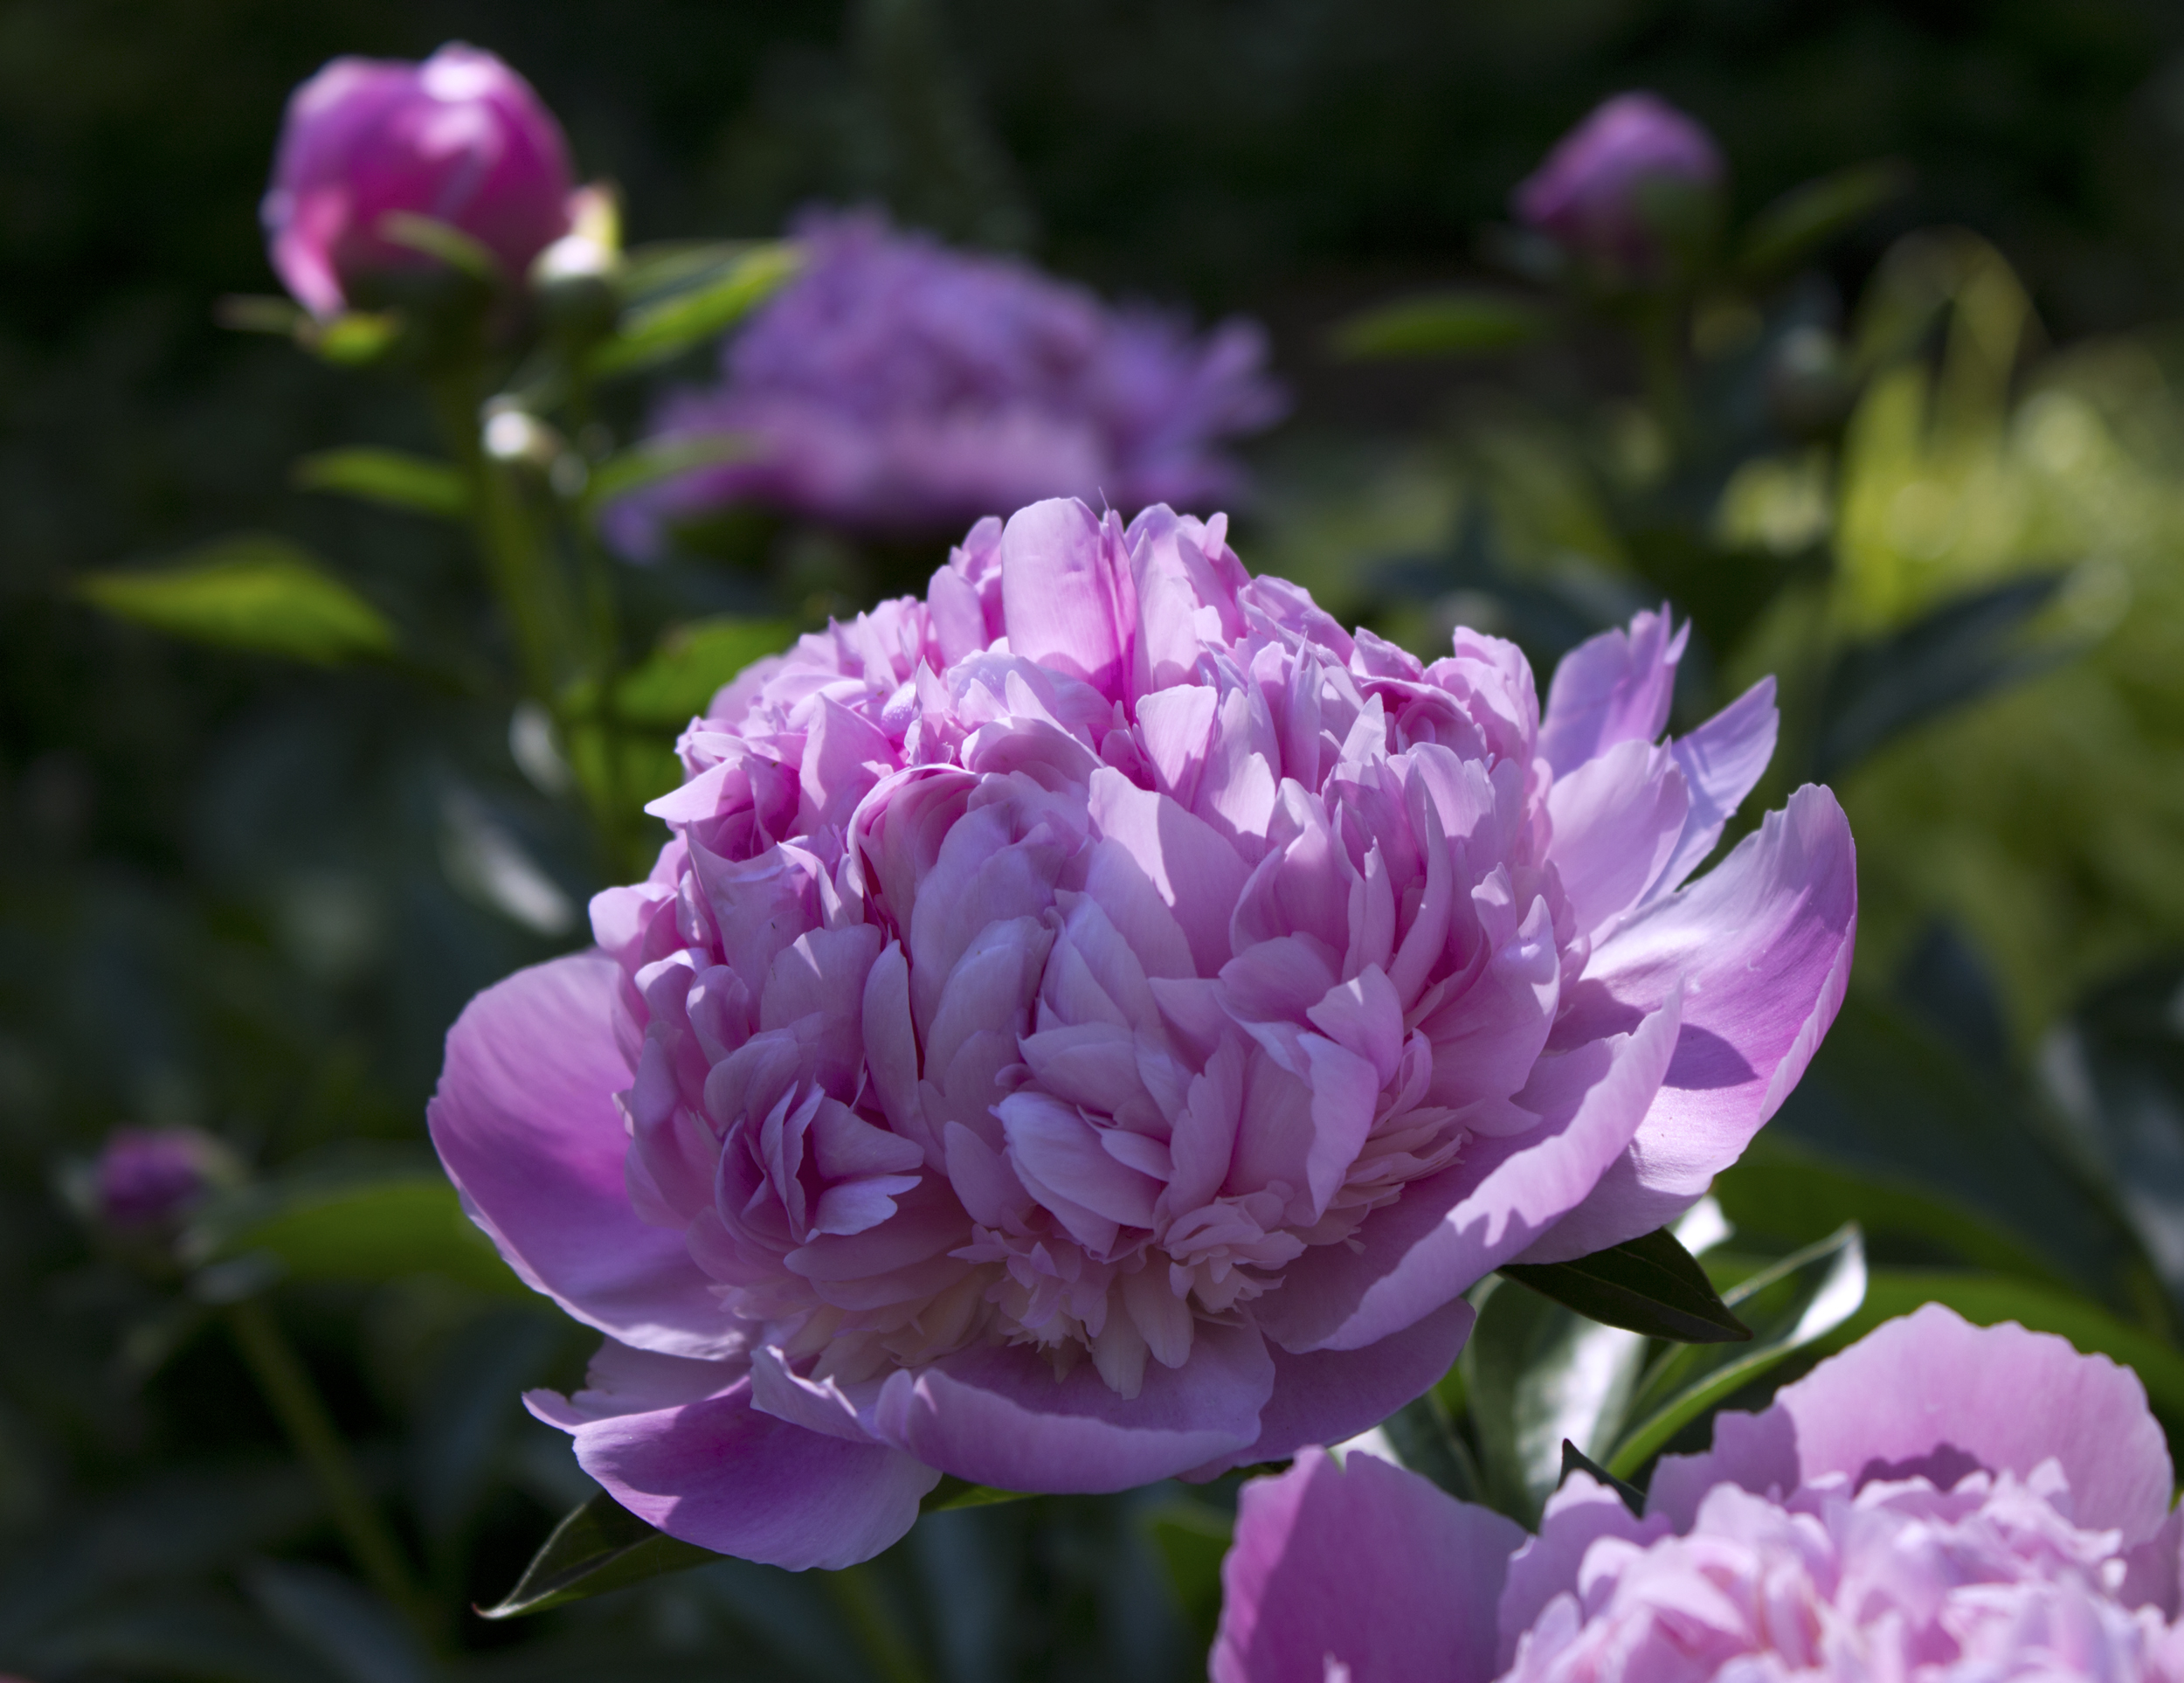 Plant Some Springtime Fragrance - Osmocote® Plant Food 2017-06-22 15:00